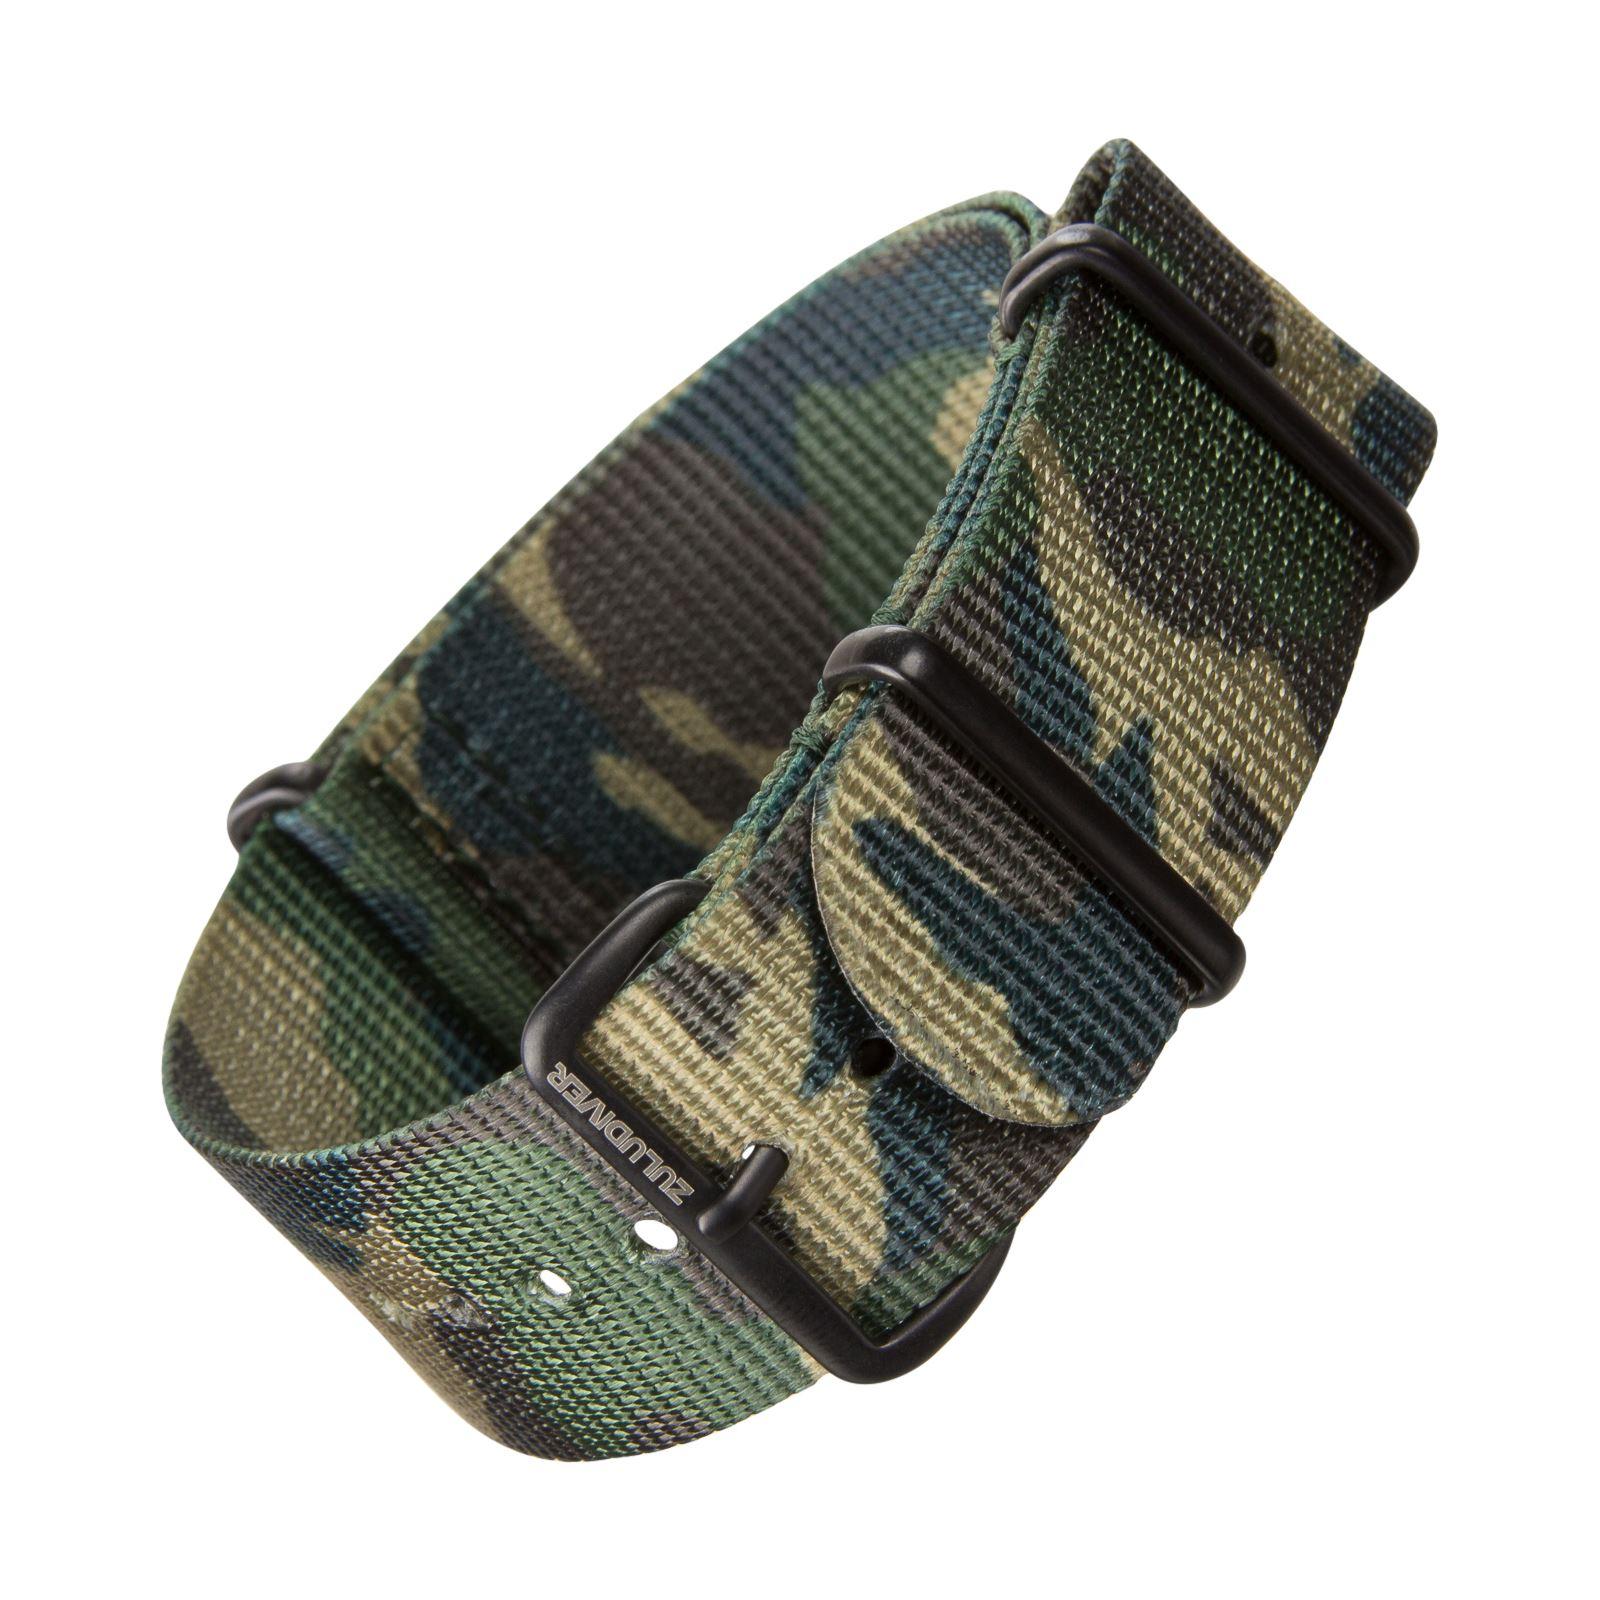 Shop Camouflage Watch Band UK - uk.dhgate.com